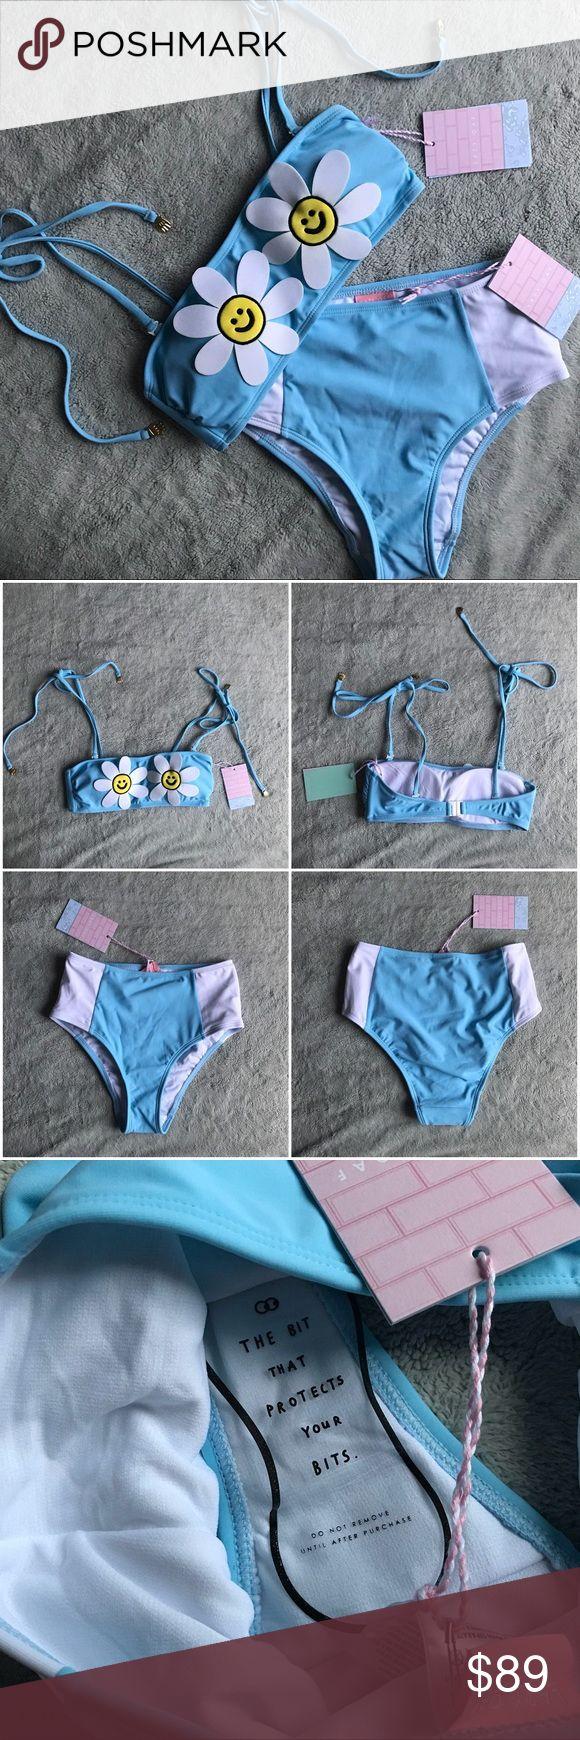 NWT Lazy Oaf Daisy Boob Bikini Floral Swimsuit Set Brand new, never worn. Daisy …